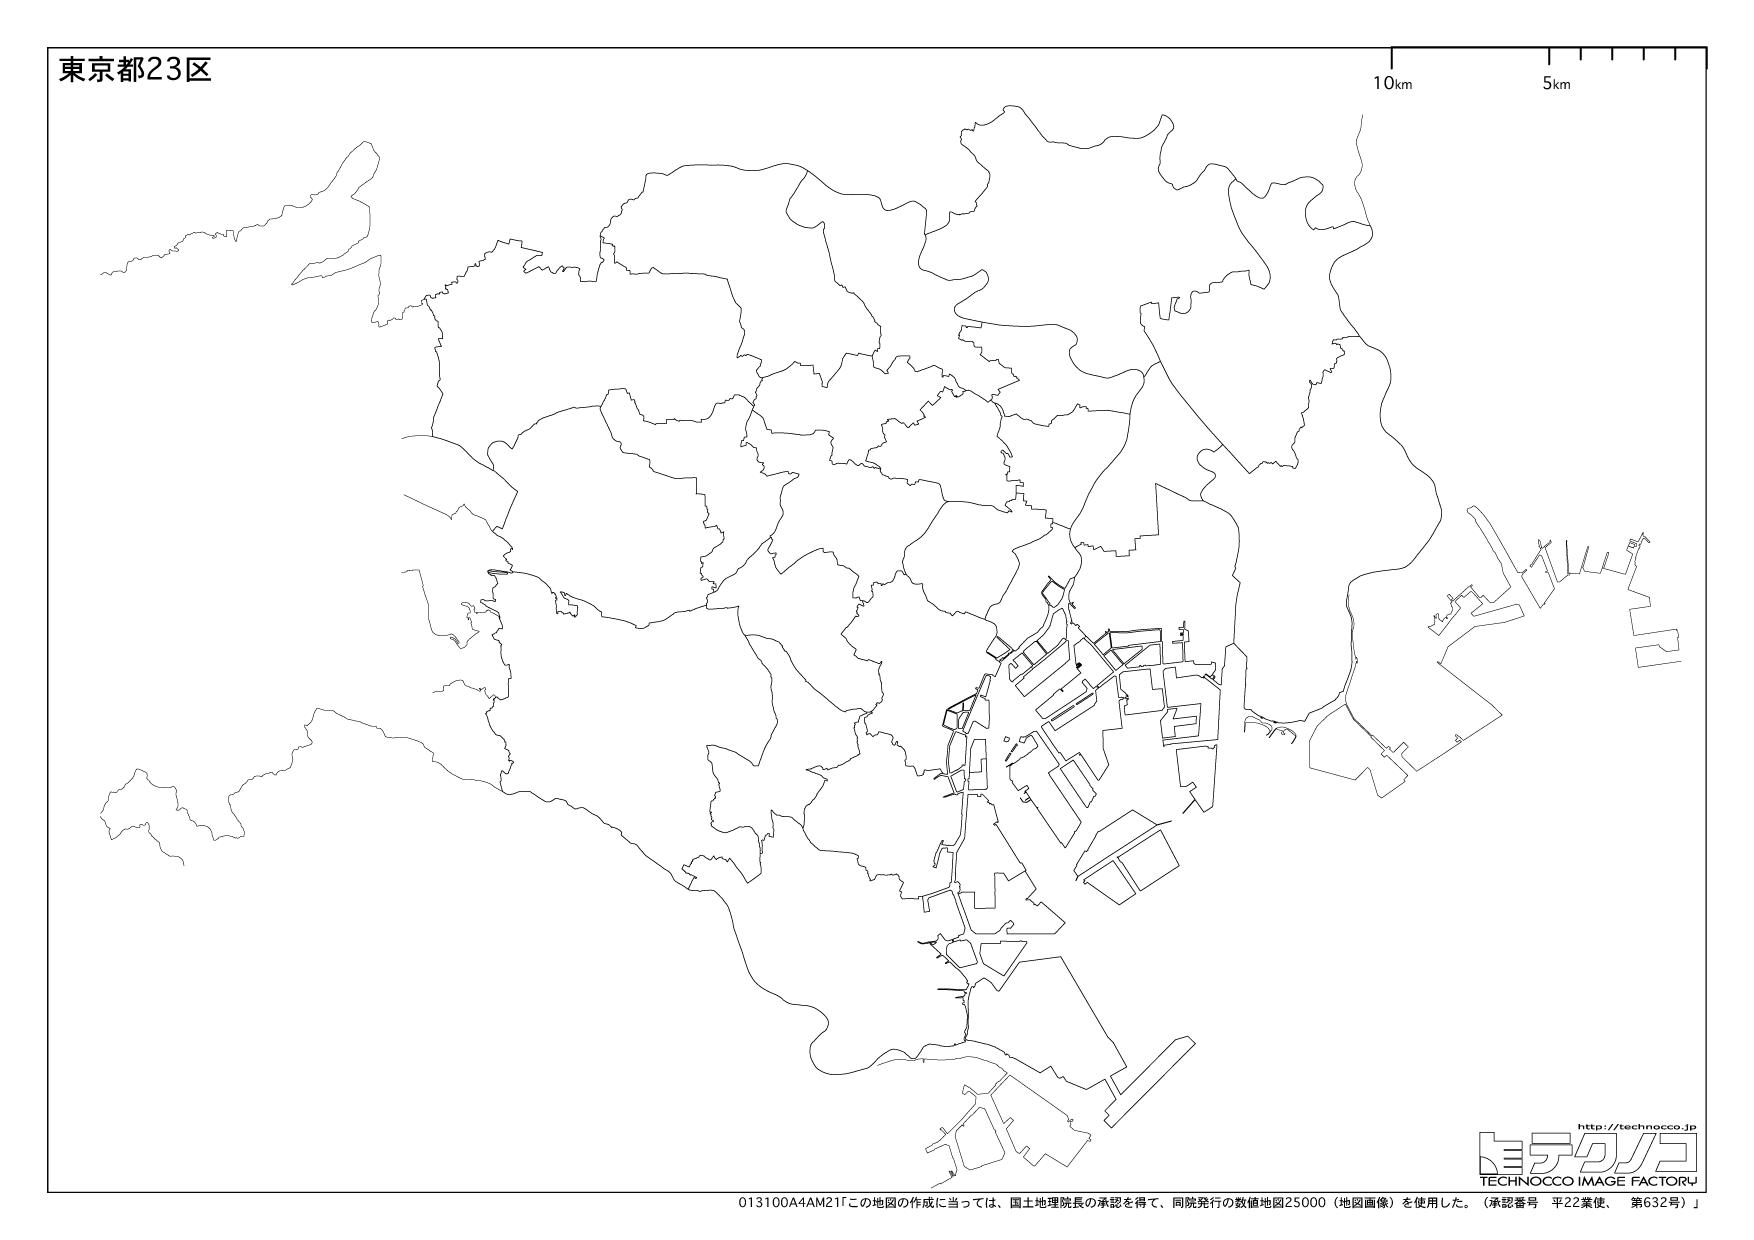 東京 23 区 の 地図